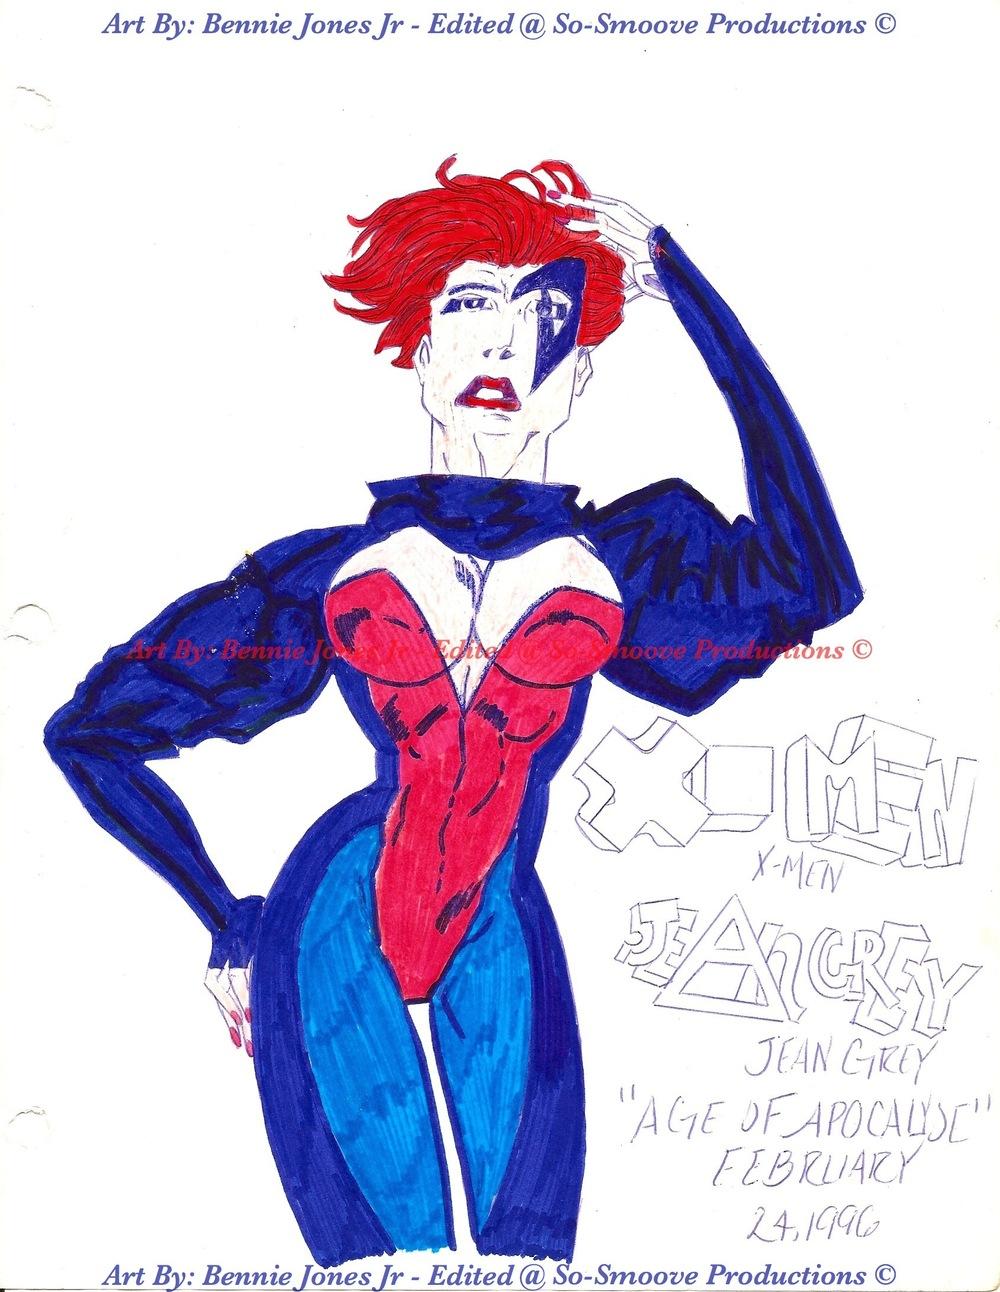 Jean Grey 4.jpg